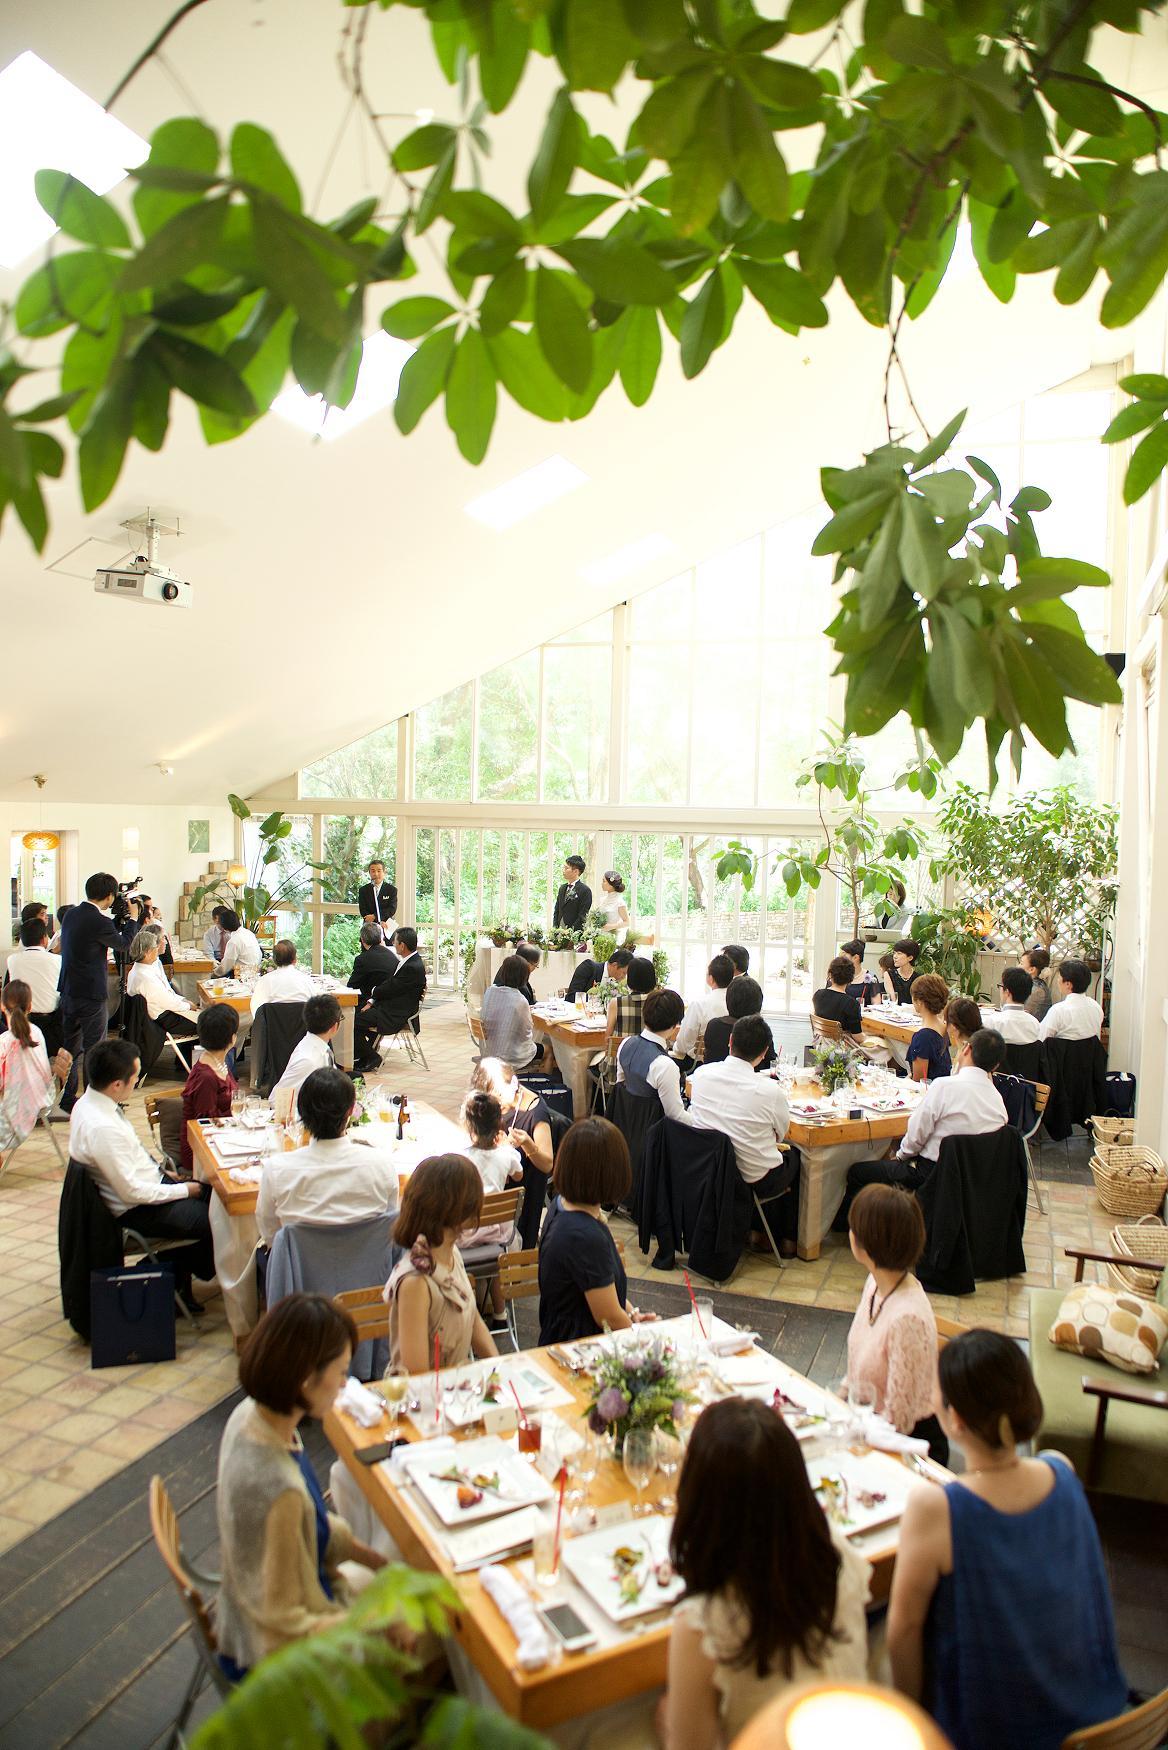 GREENHILL WEDDING ~FLOWER①~